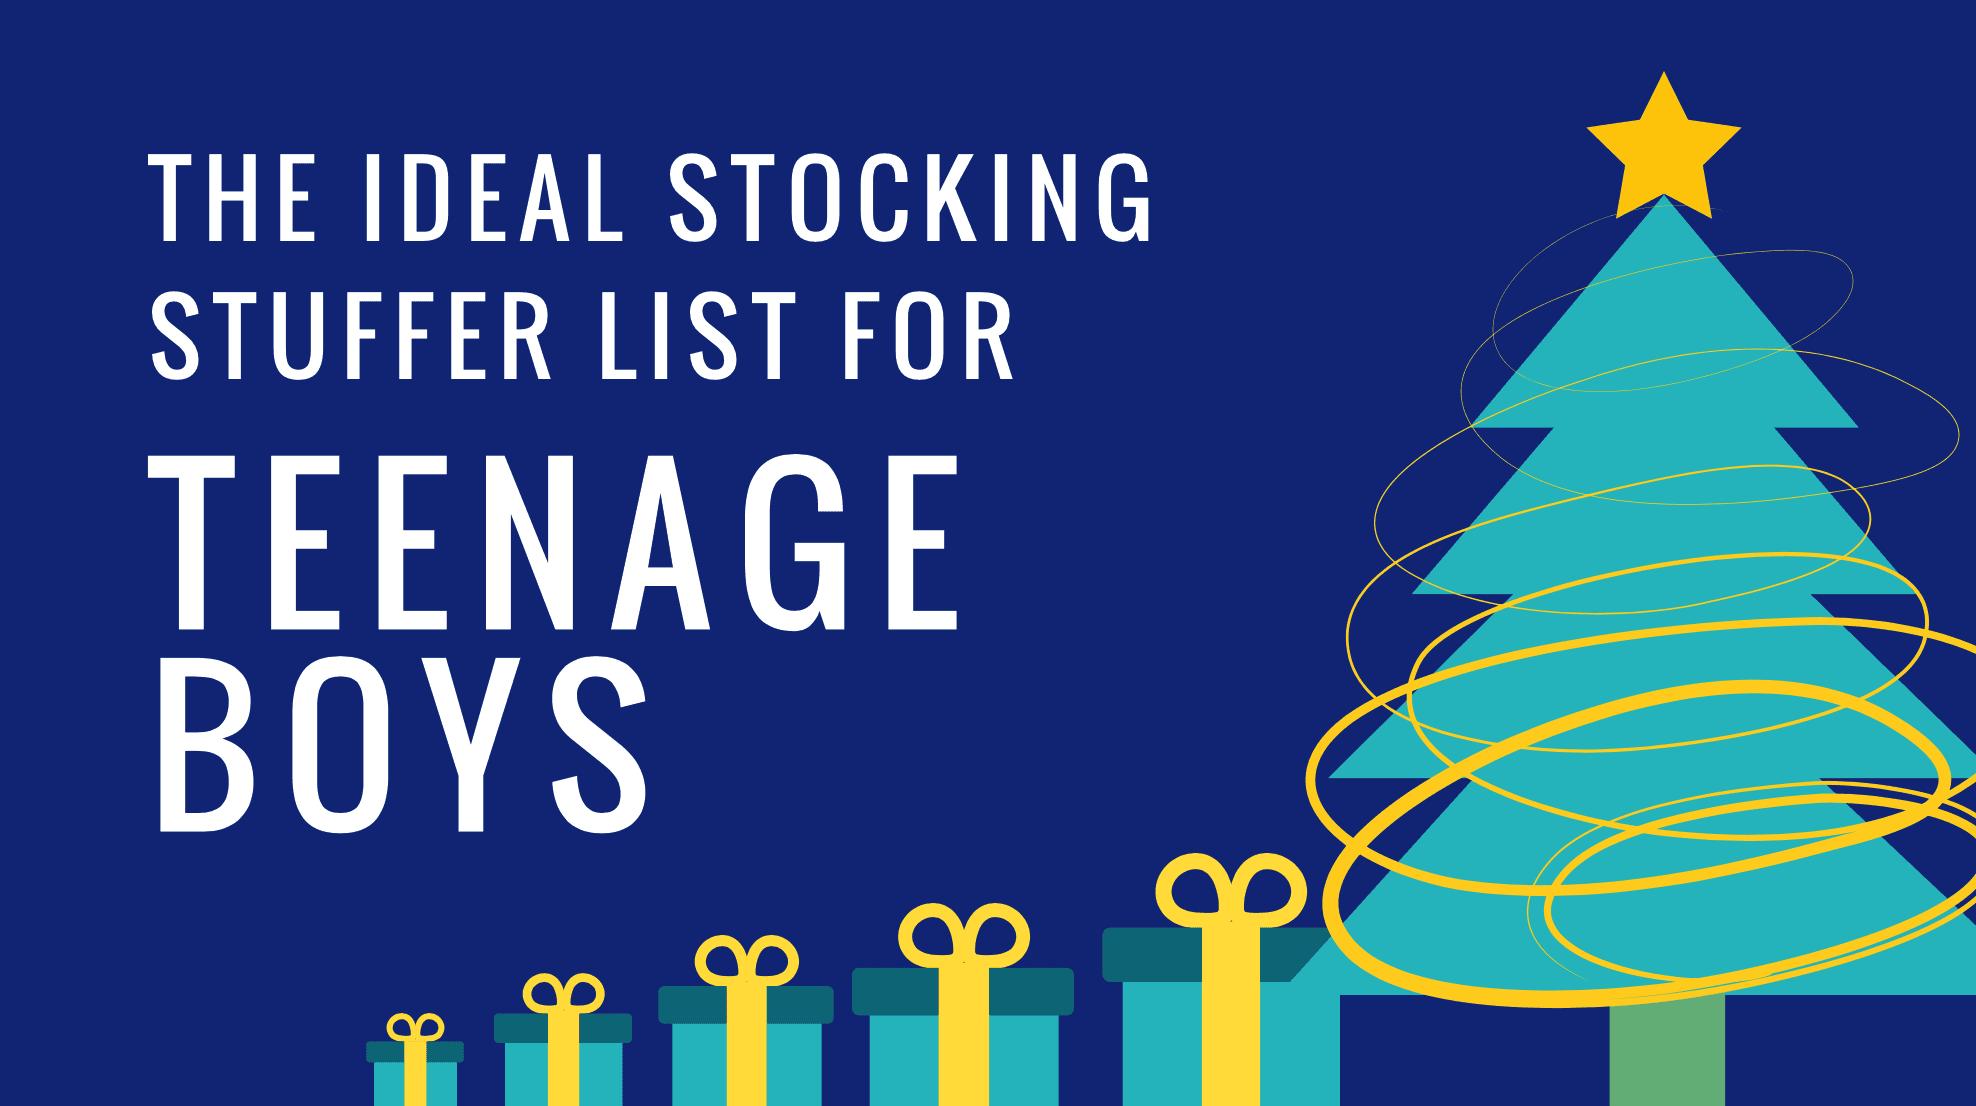 stocking stuffer ideas for teenage boys